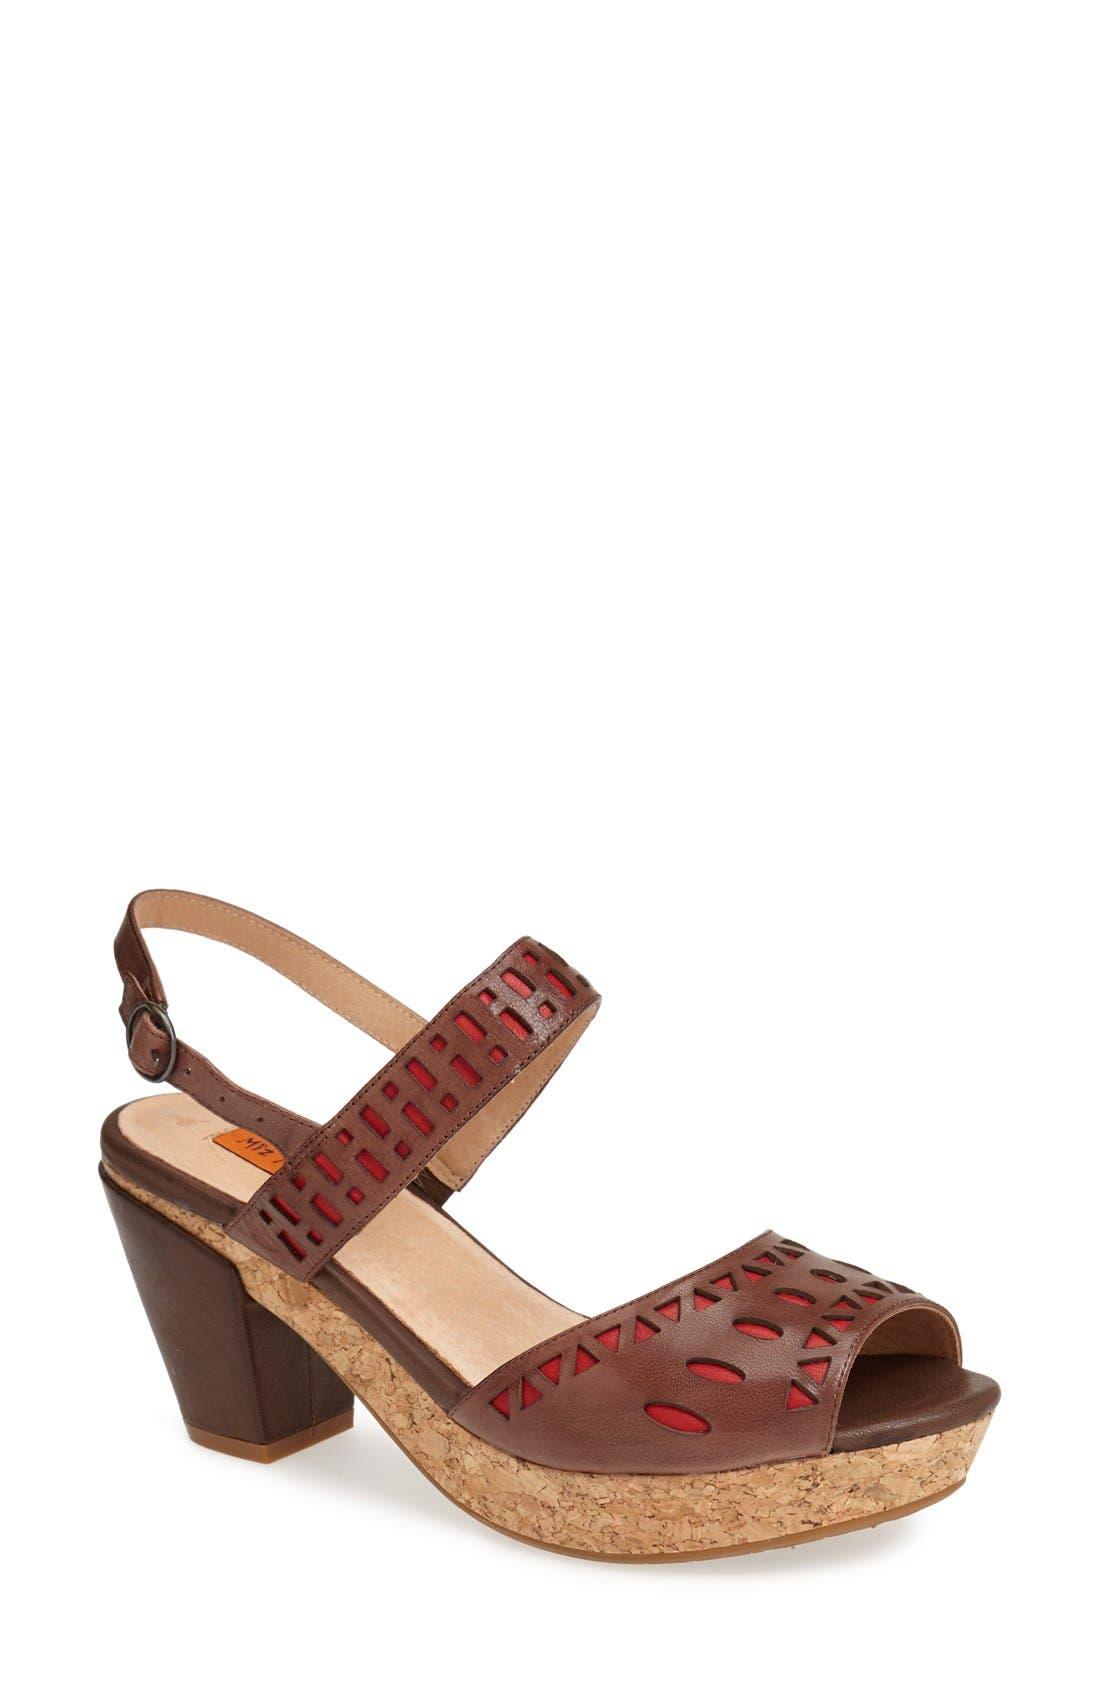 Main Image - Miz Mooz 'Roma' Perforated Leather Sandal (Women)(Special Purchase)